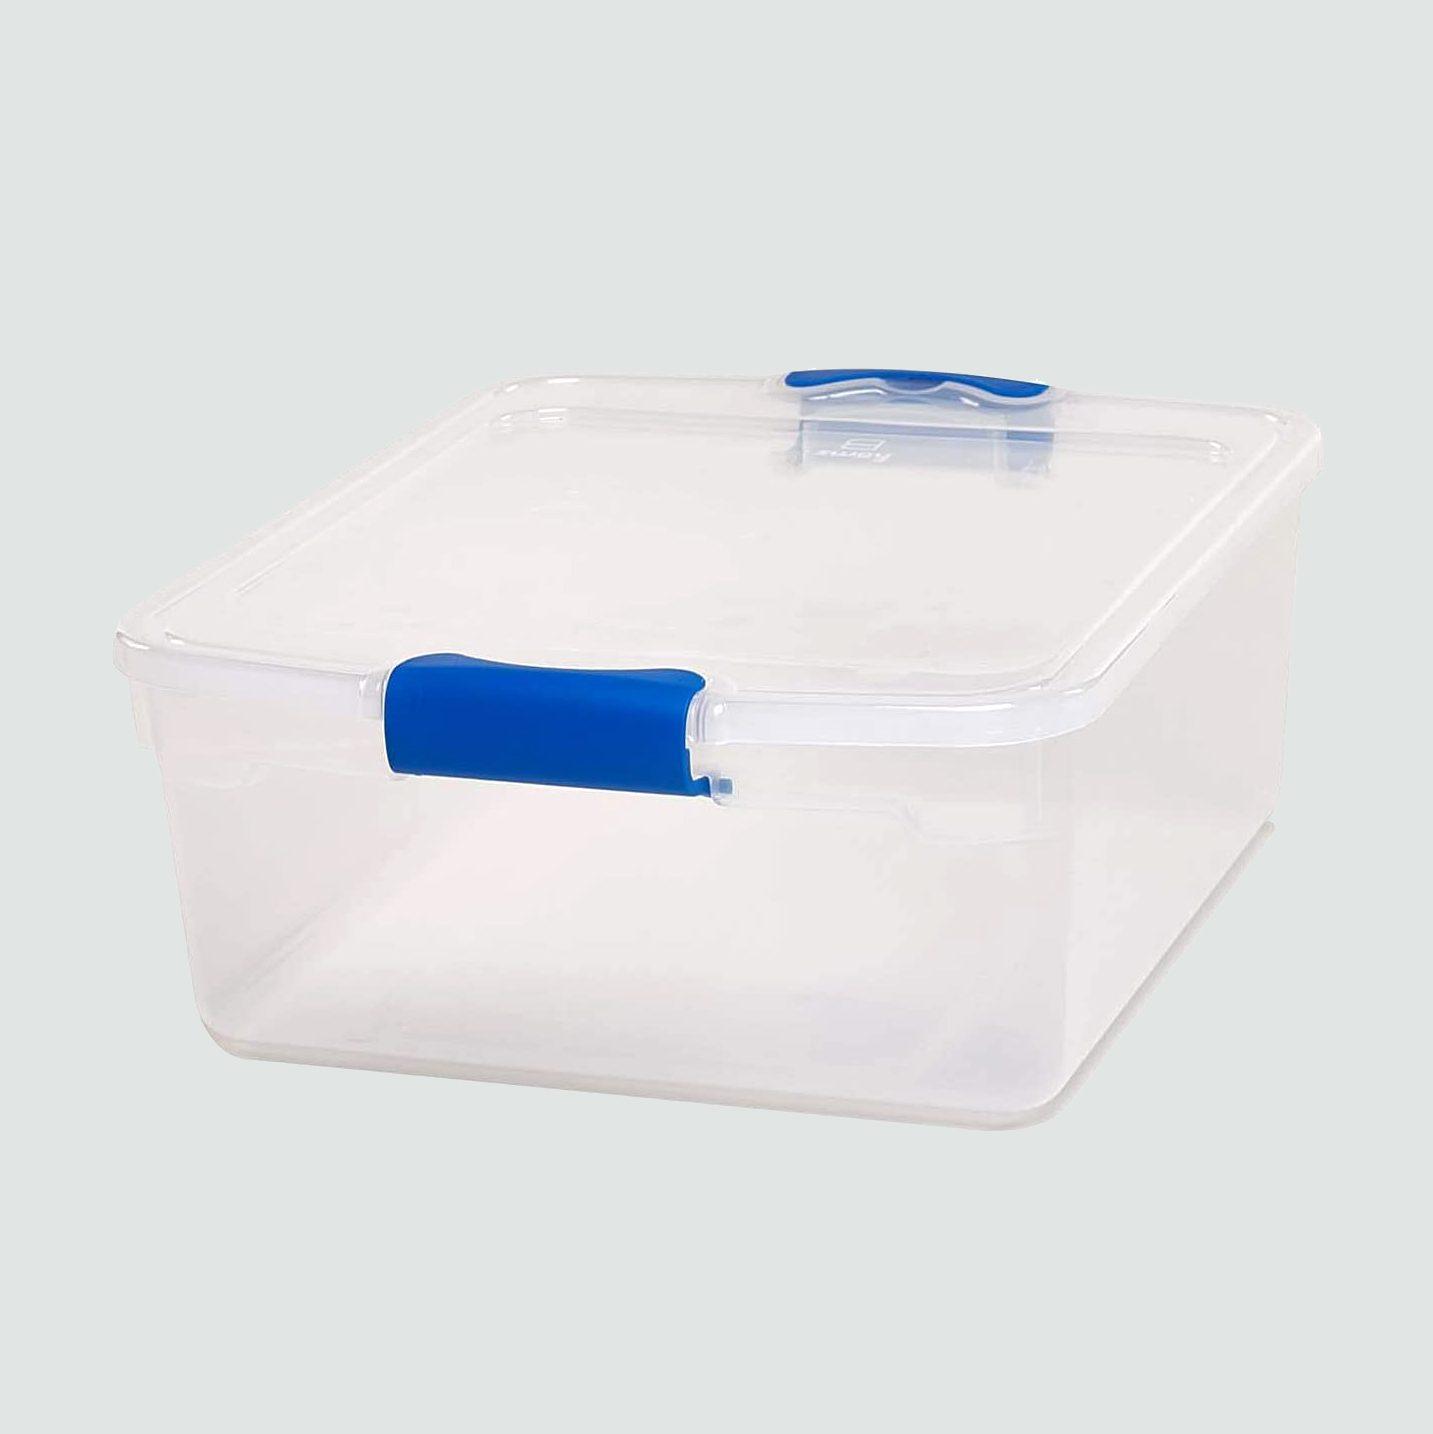 Homz large storage bins, 5 pack